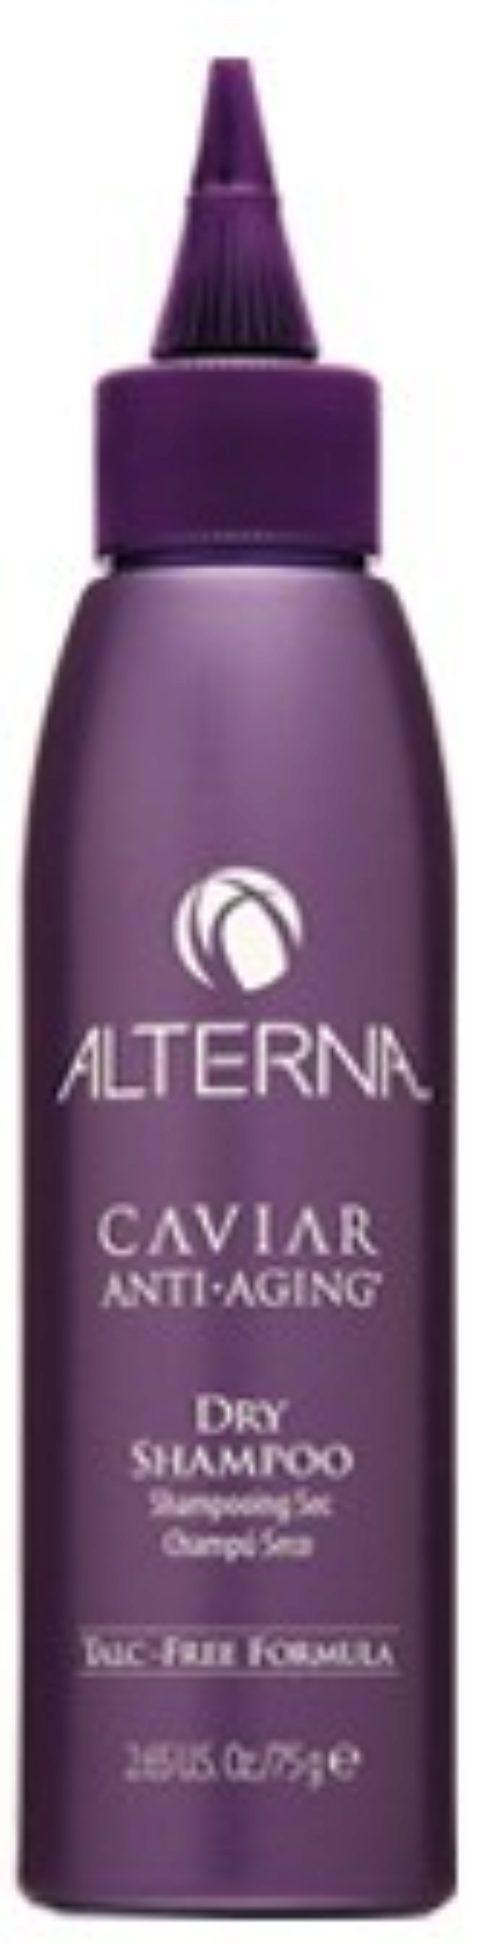 Alterna Caviar Anti aging Dry shampoo 75gr - champù seco